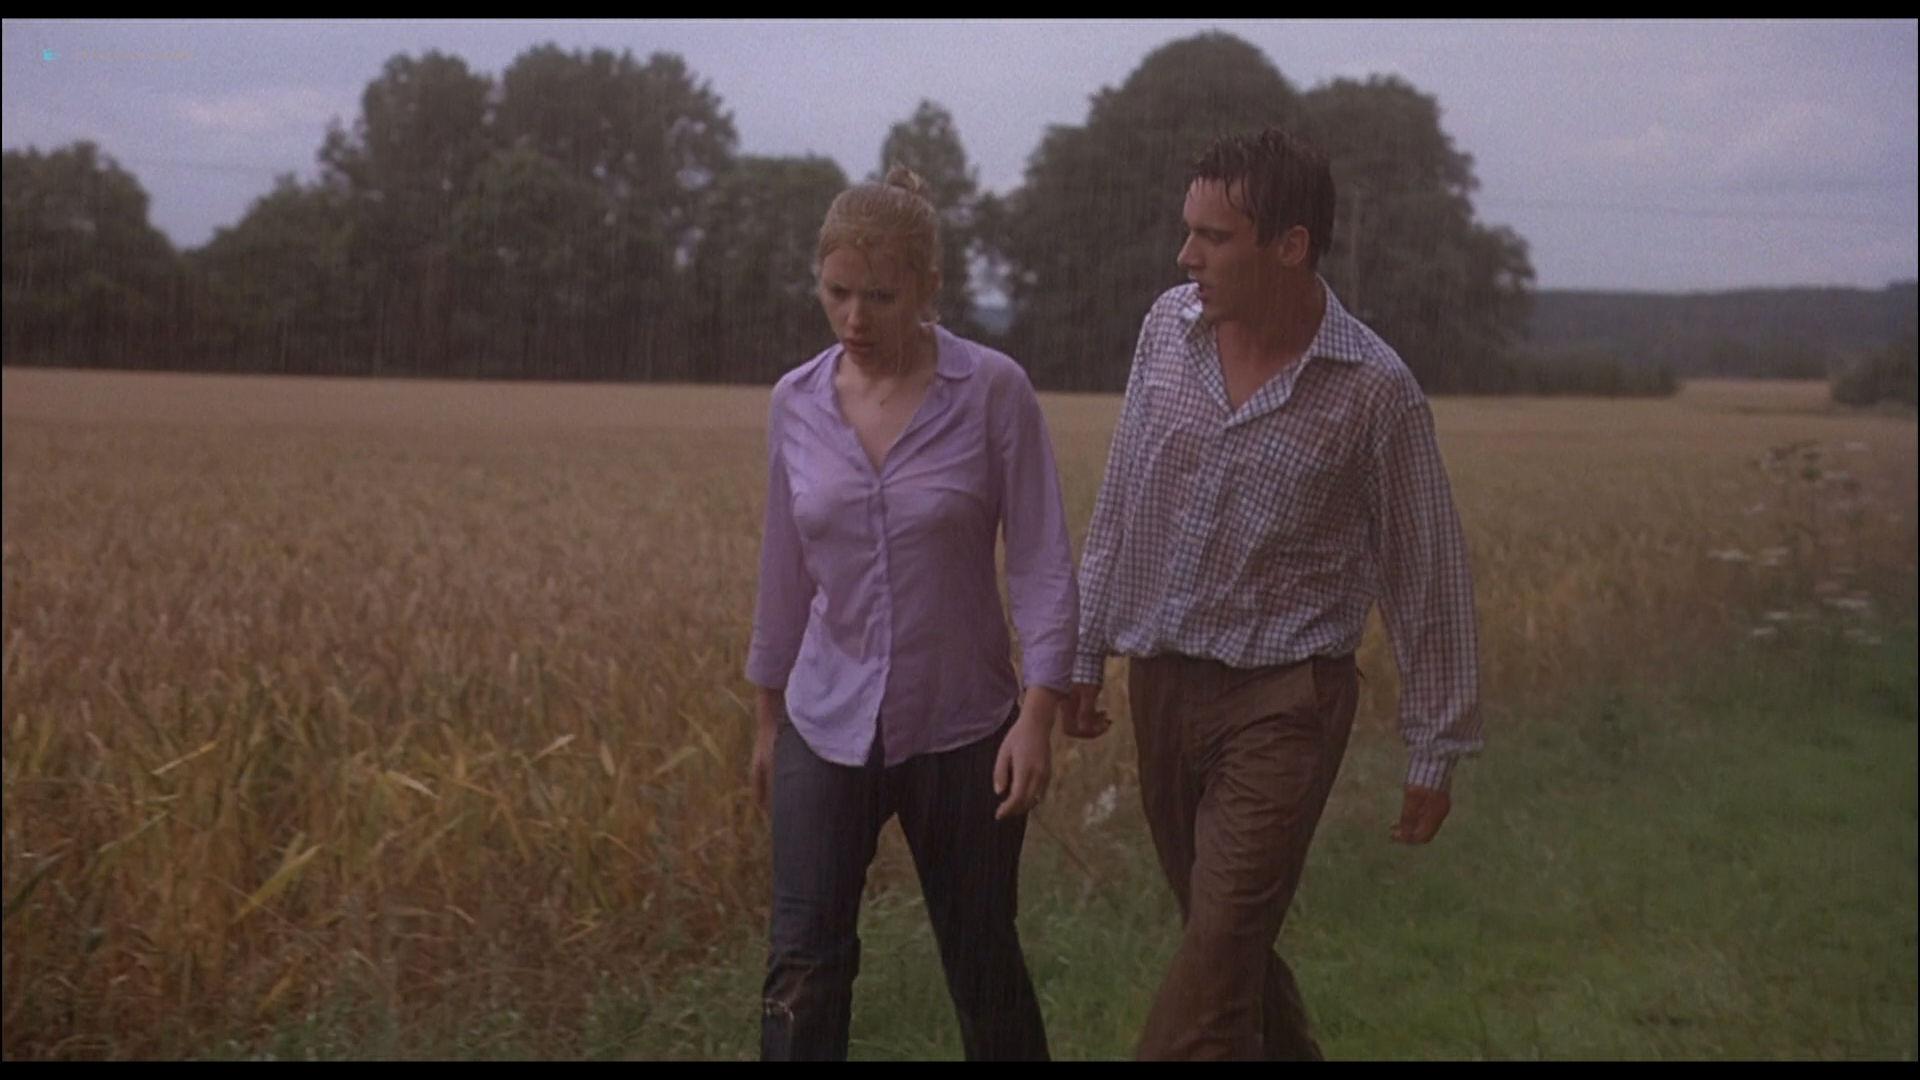 Scarlett Johansson see through and sex - Match Point (2005) HD 1080p BluRay (15)